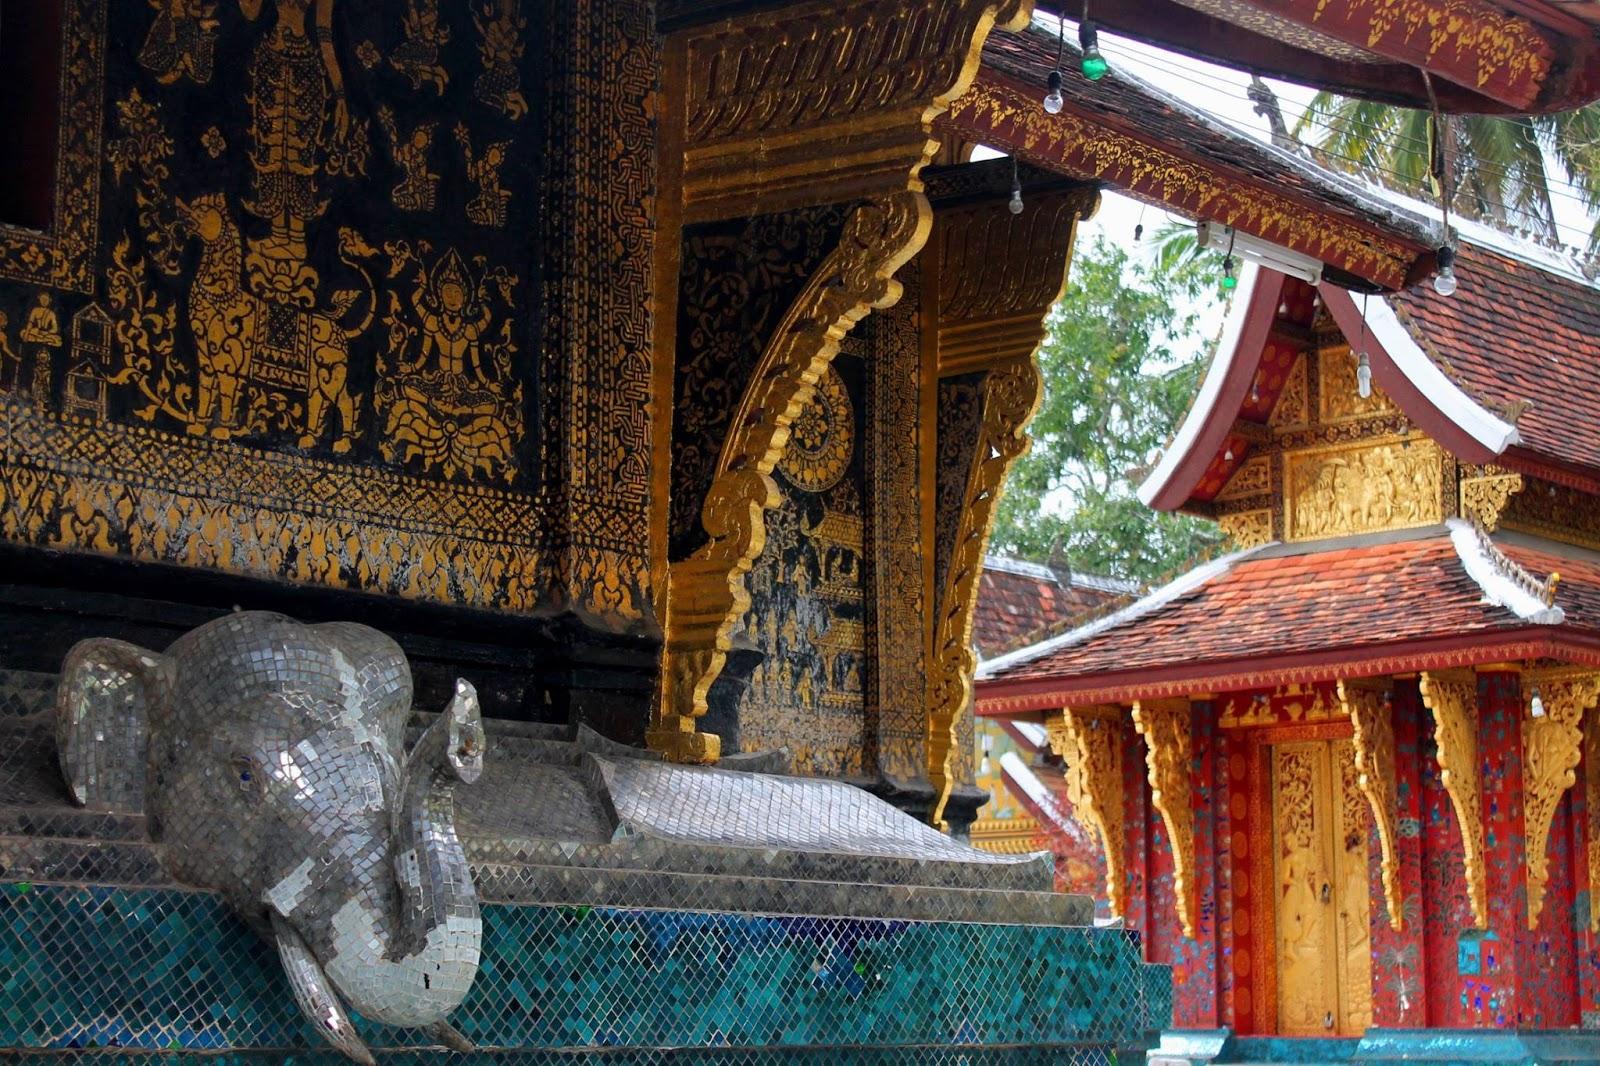 Luang Prabang in dieci pensieri e altrettante immagini…